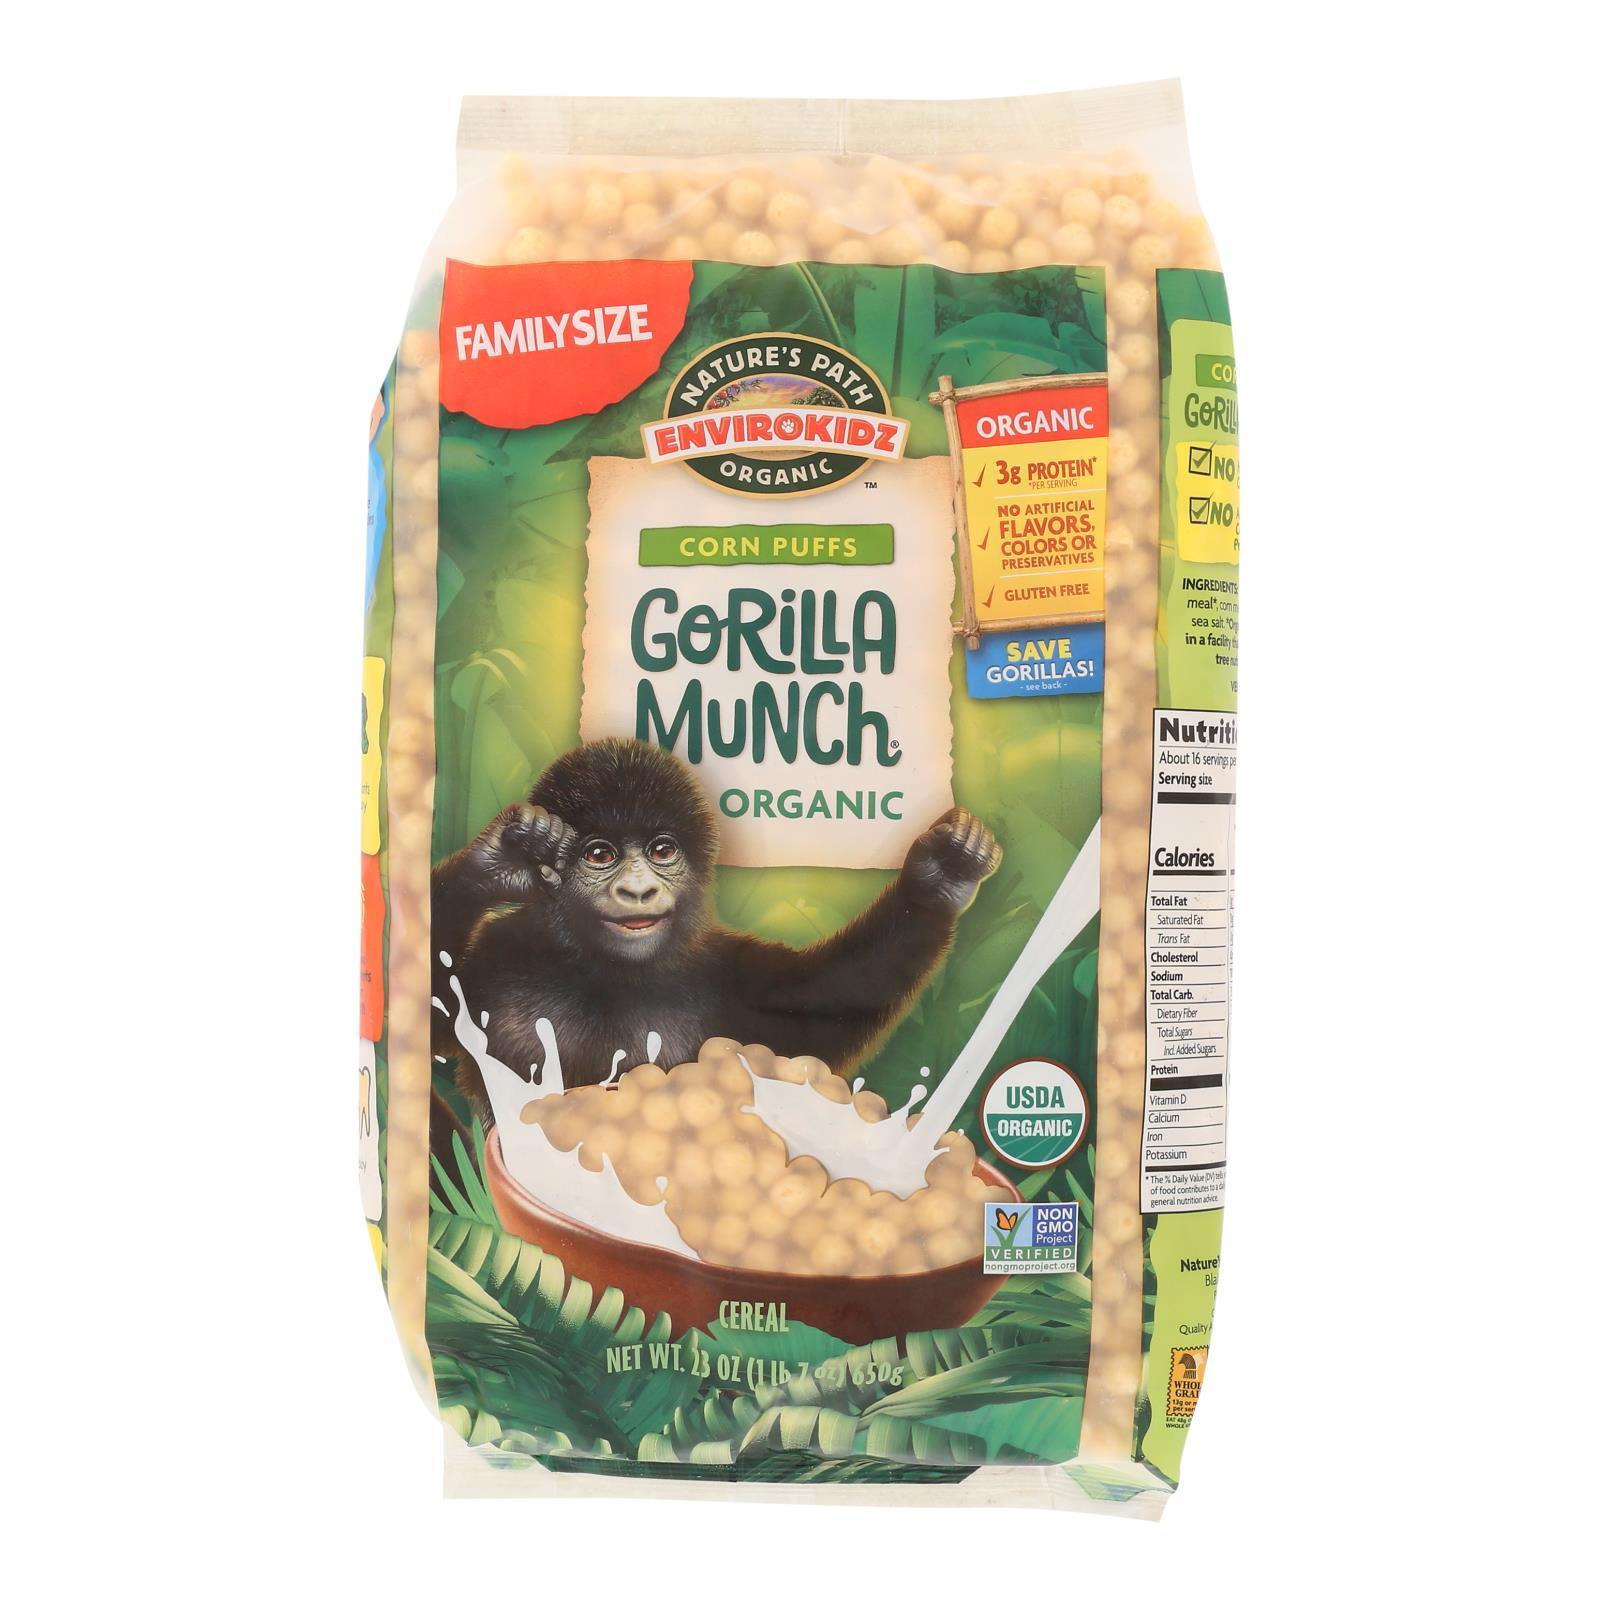 Envirokidz Corn Puff - Gorilla Munch - Case of 6 - 23 oz.